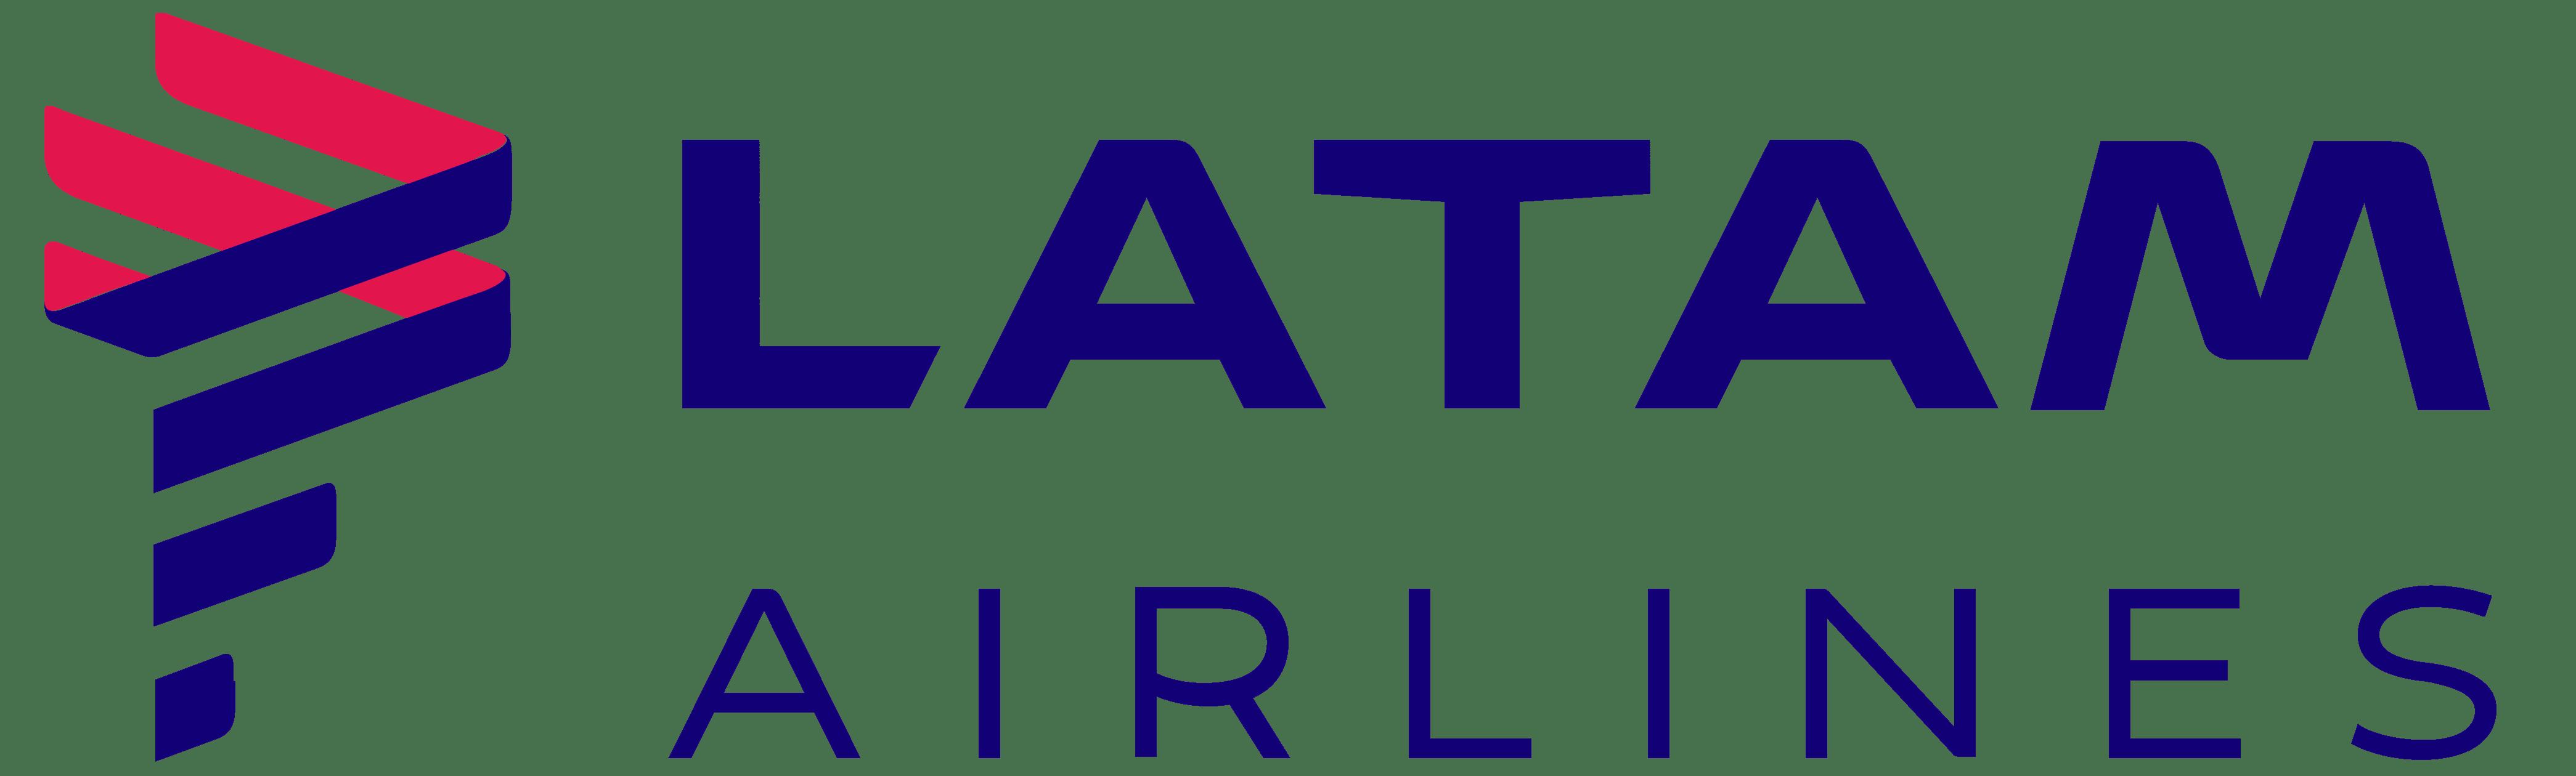 Resultado de imagen para Latam logo